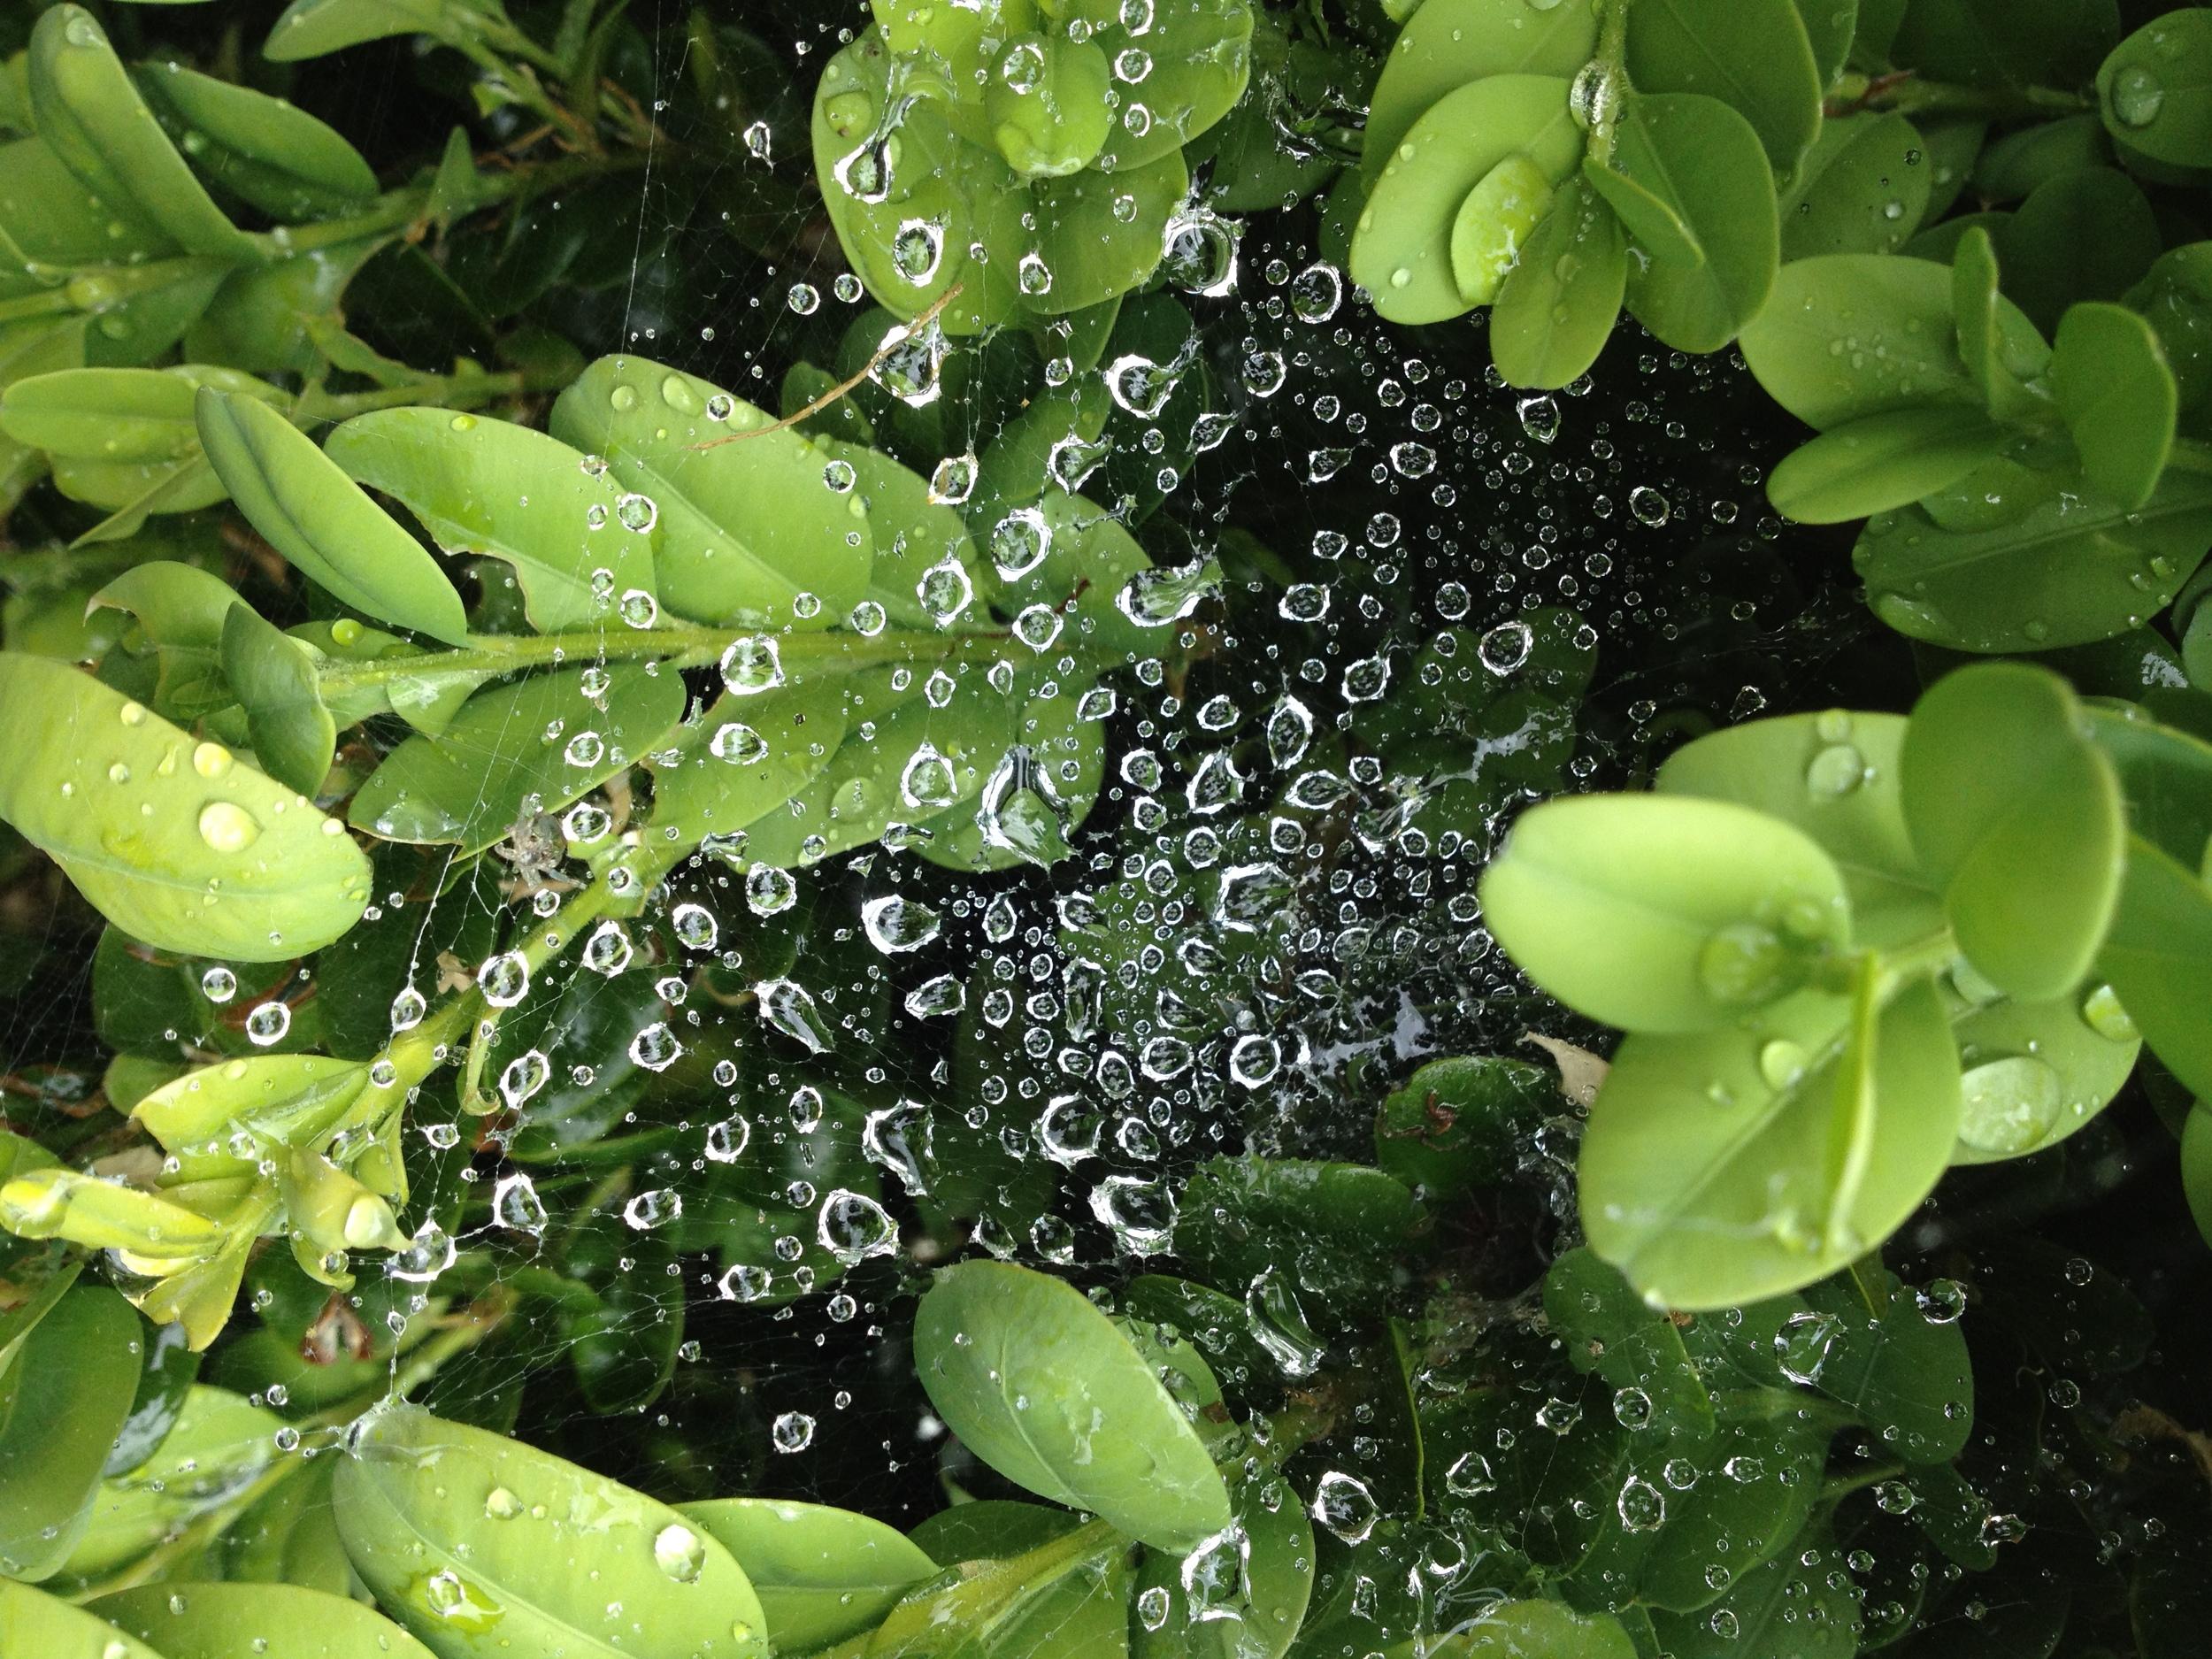 Each drop is a positive or negative Belief